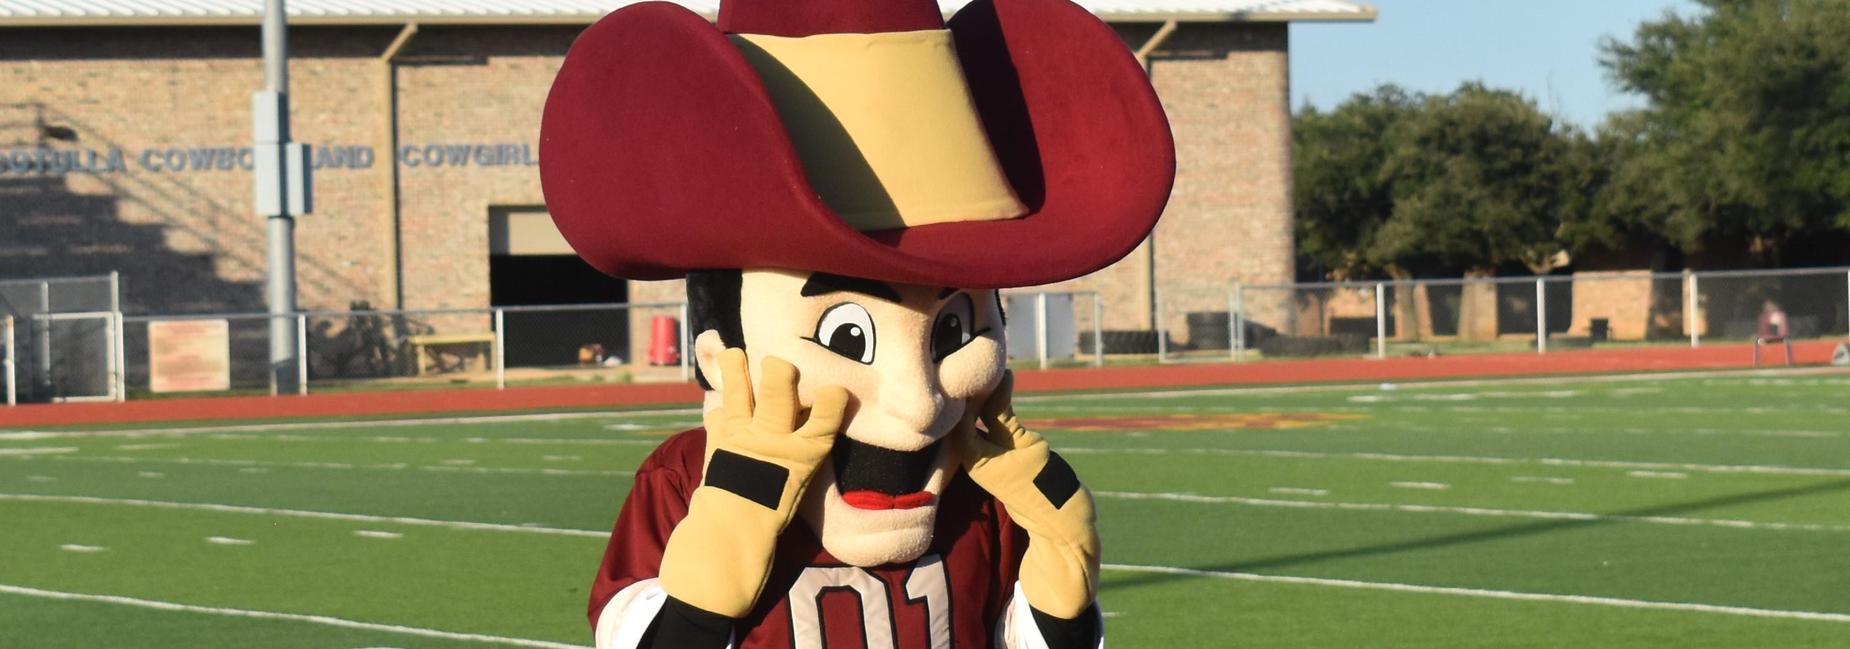 mascot cowboy cody